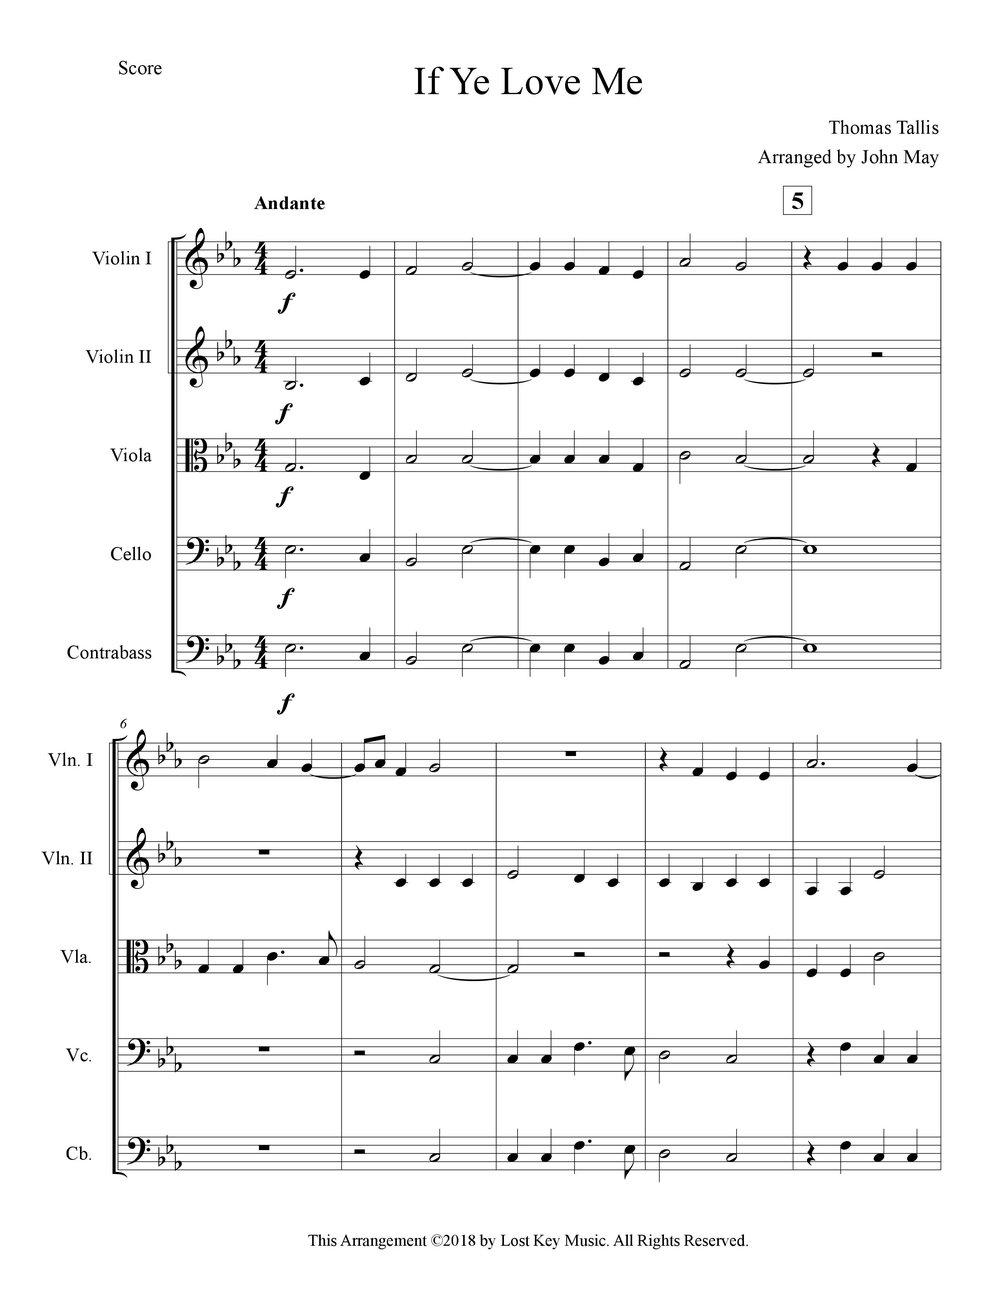 If Ye Love Me-String Orchestra-Score Sample.jpg